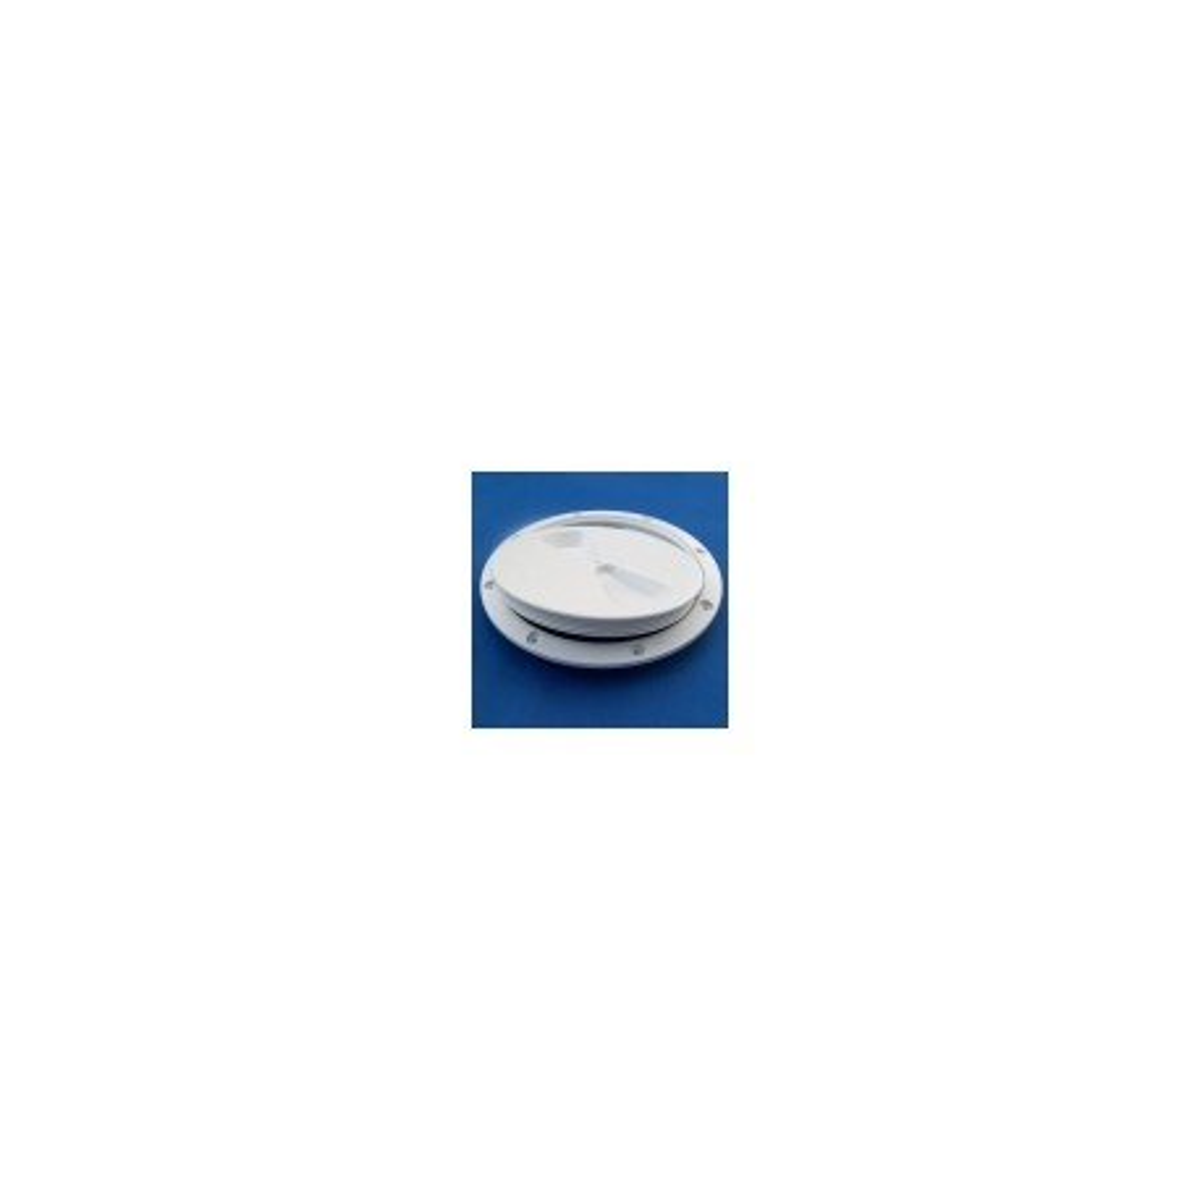 trappe de visite blanche 150mm